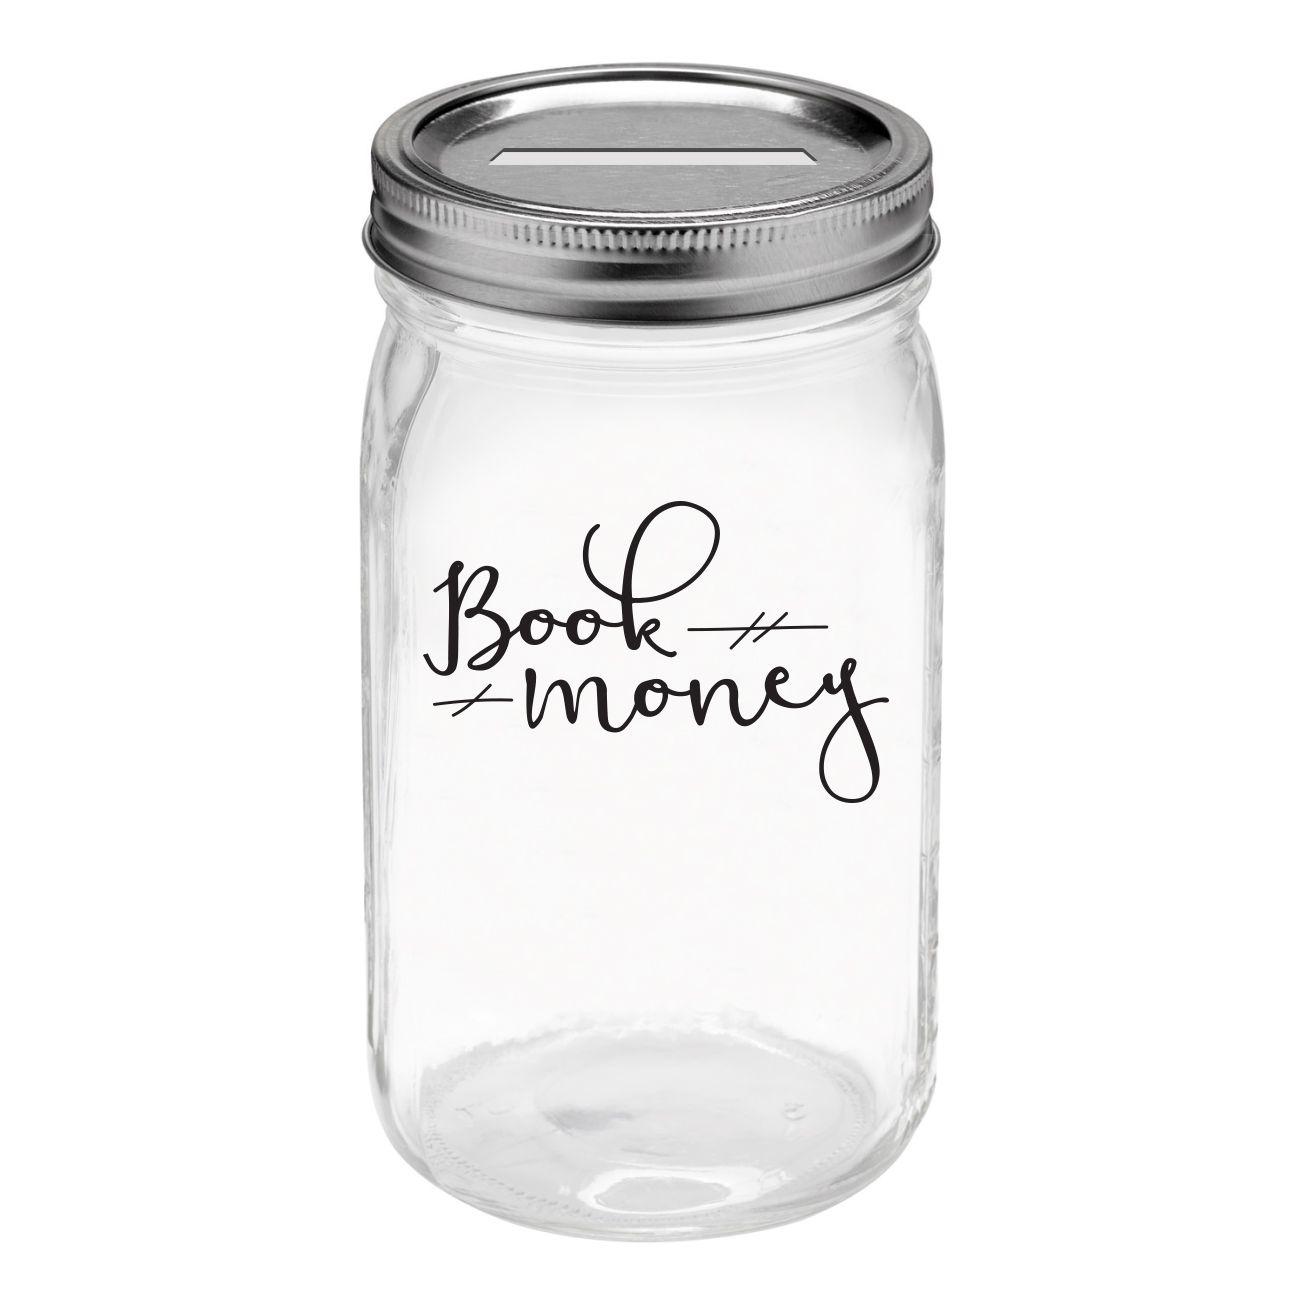 The book jar: Book money